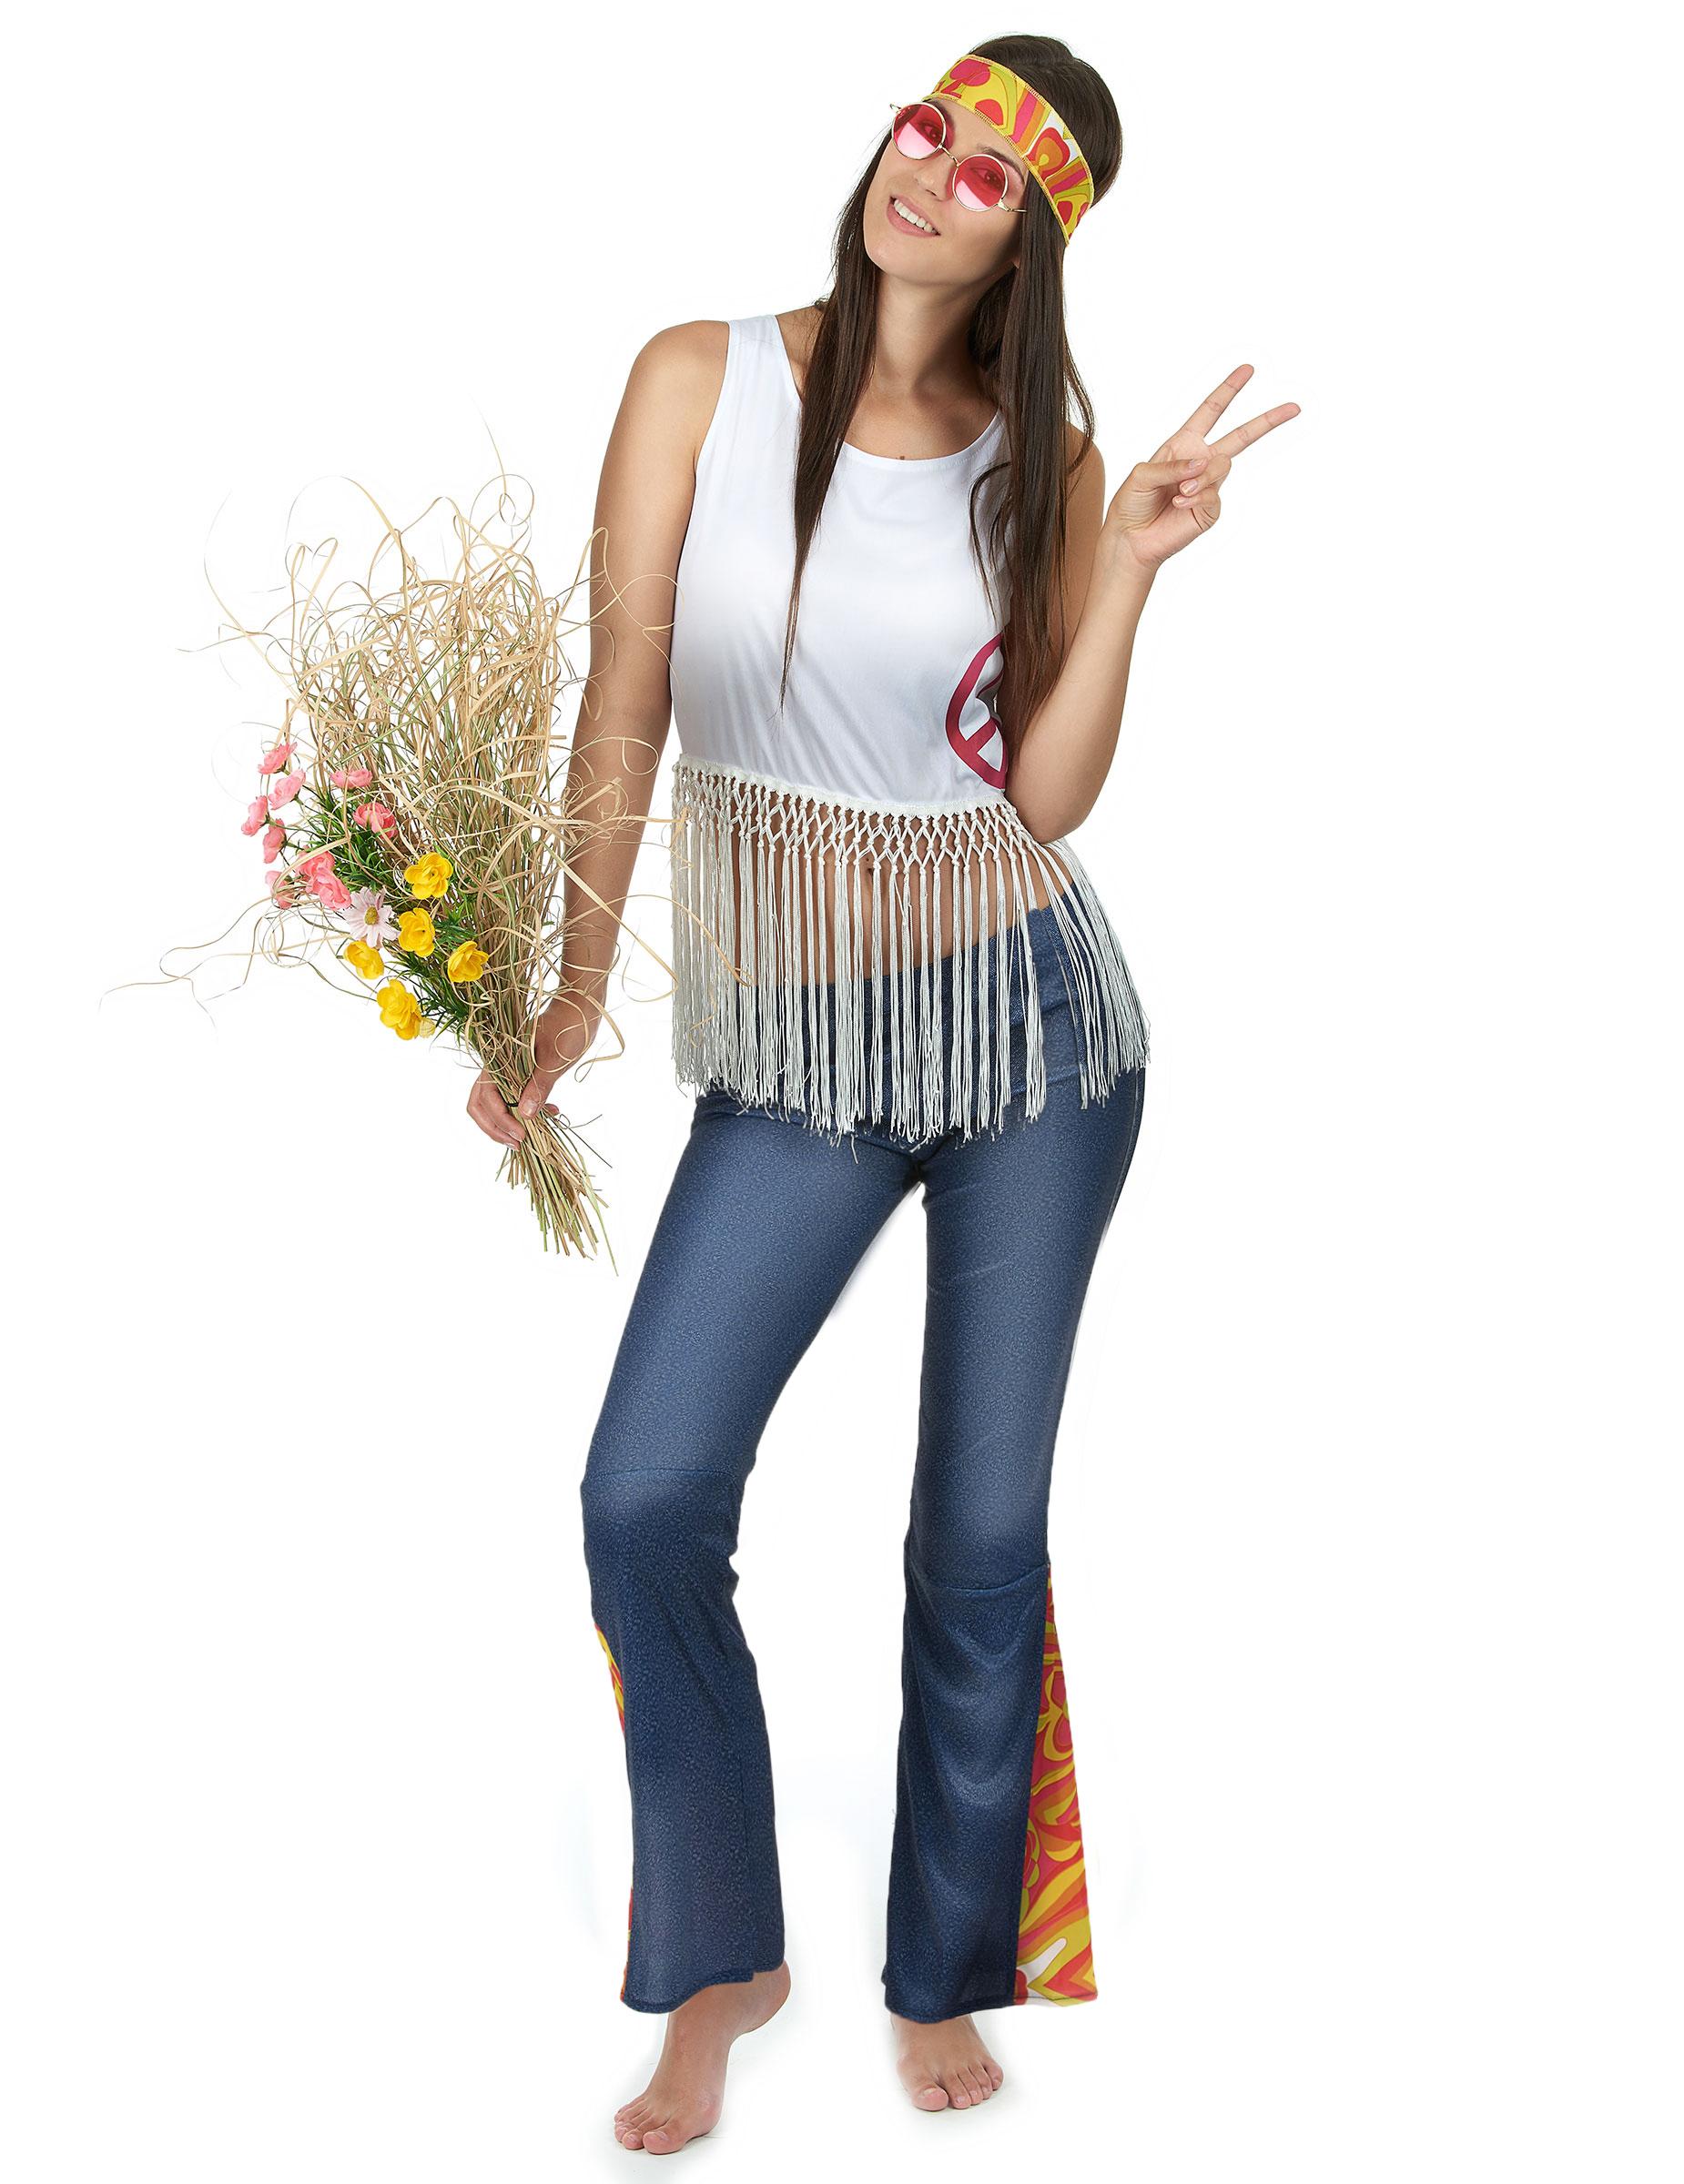 D guisement hippie femme deguise toi achat de - Look hippie femme ...